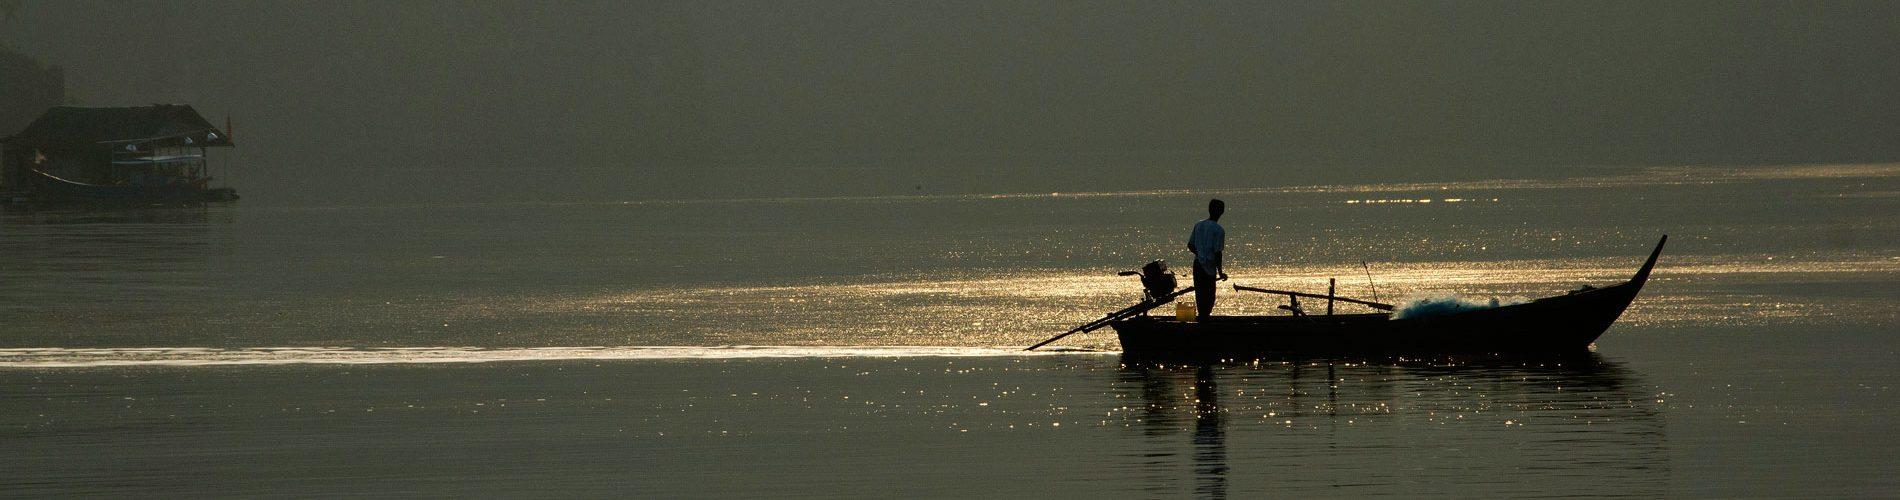 Early-morning-fishing